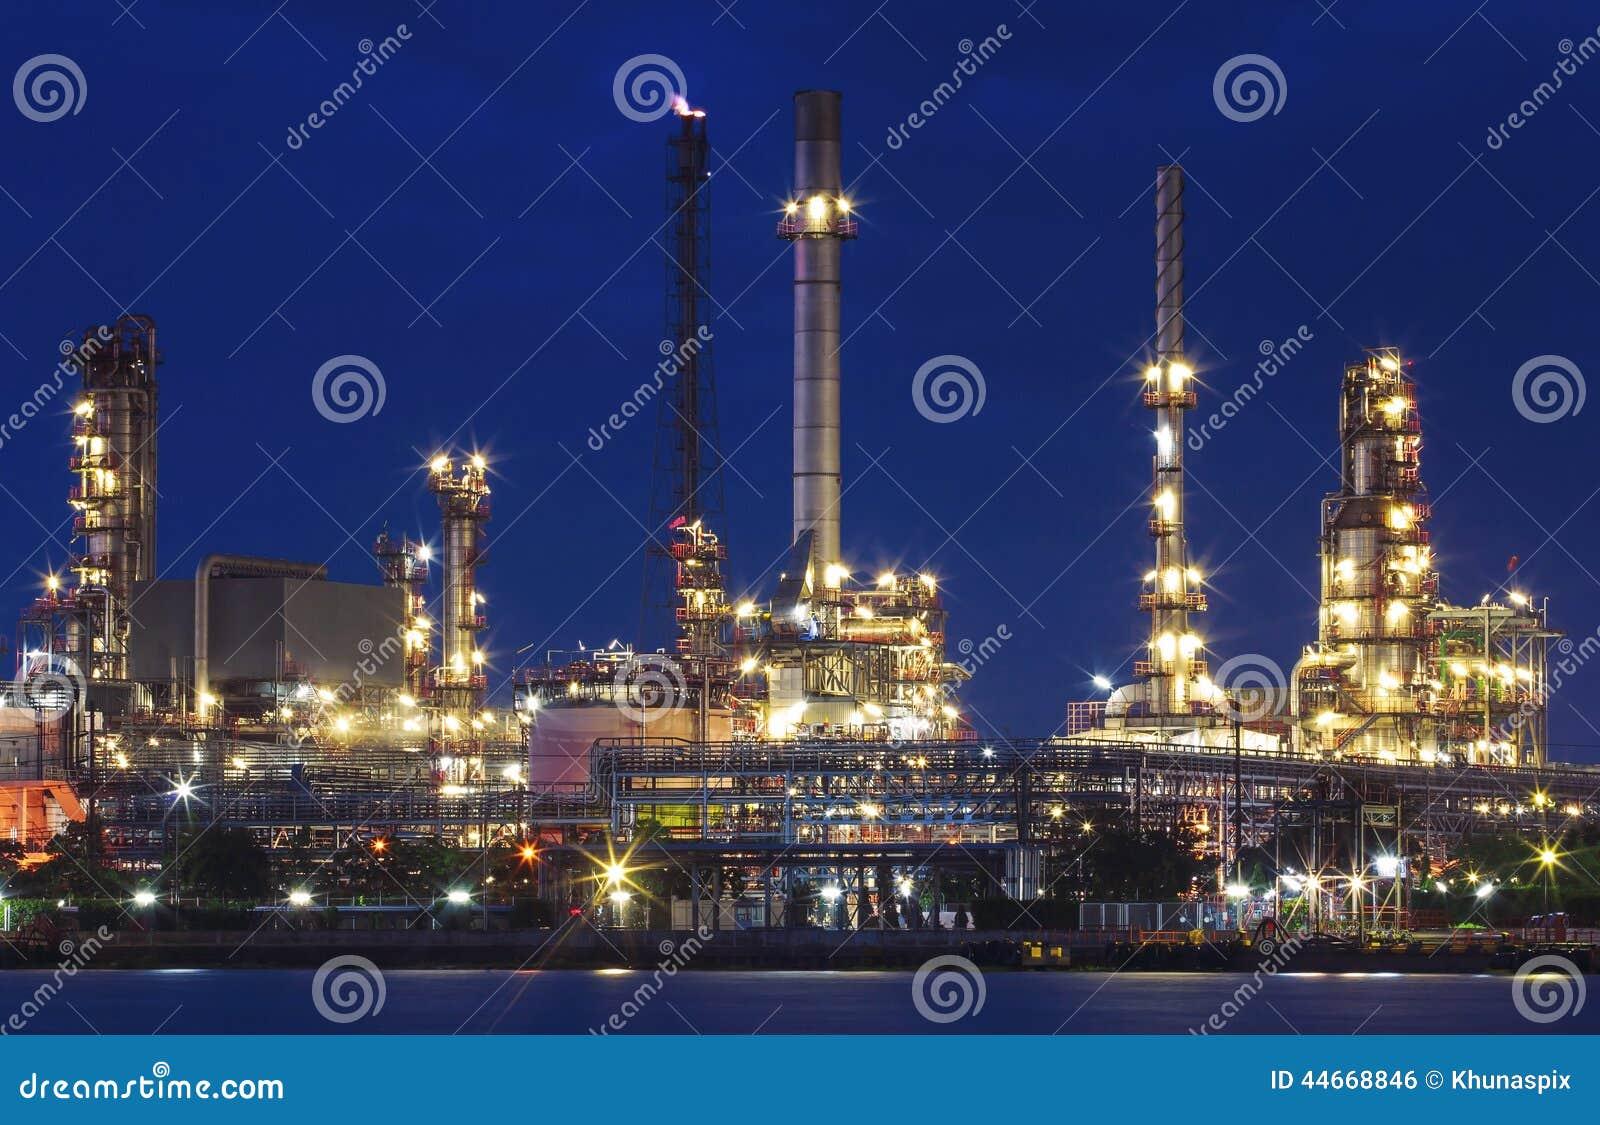 lighting-oil-refinery-plant-heavy-indust